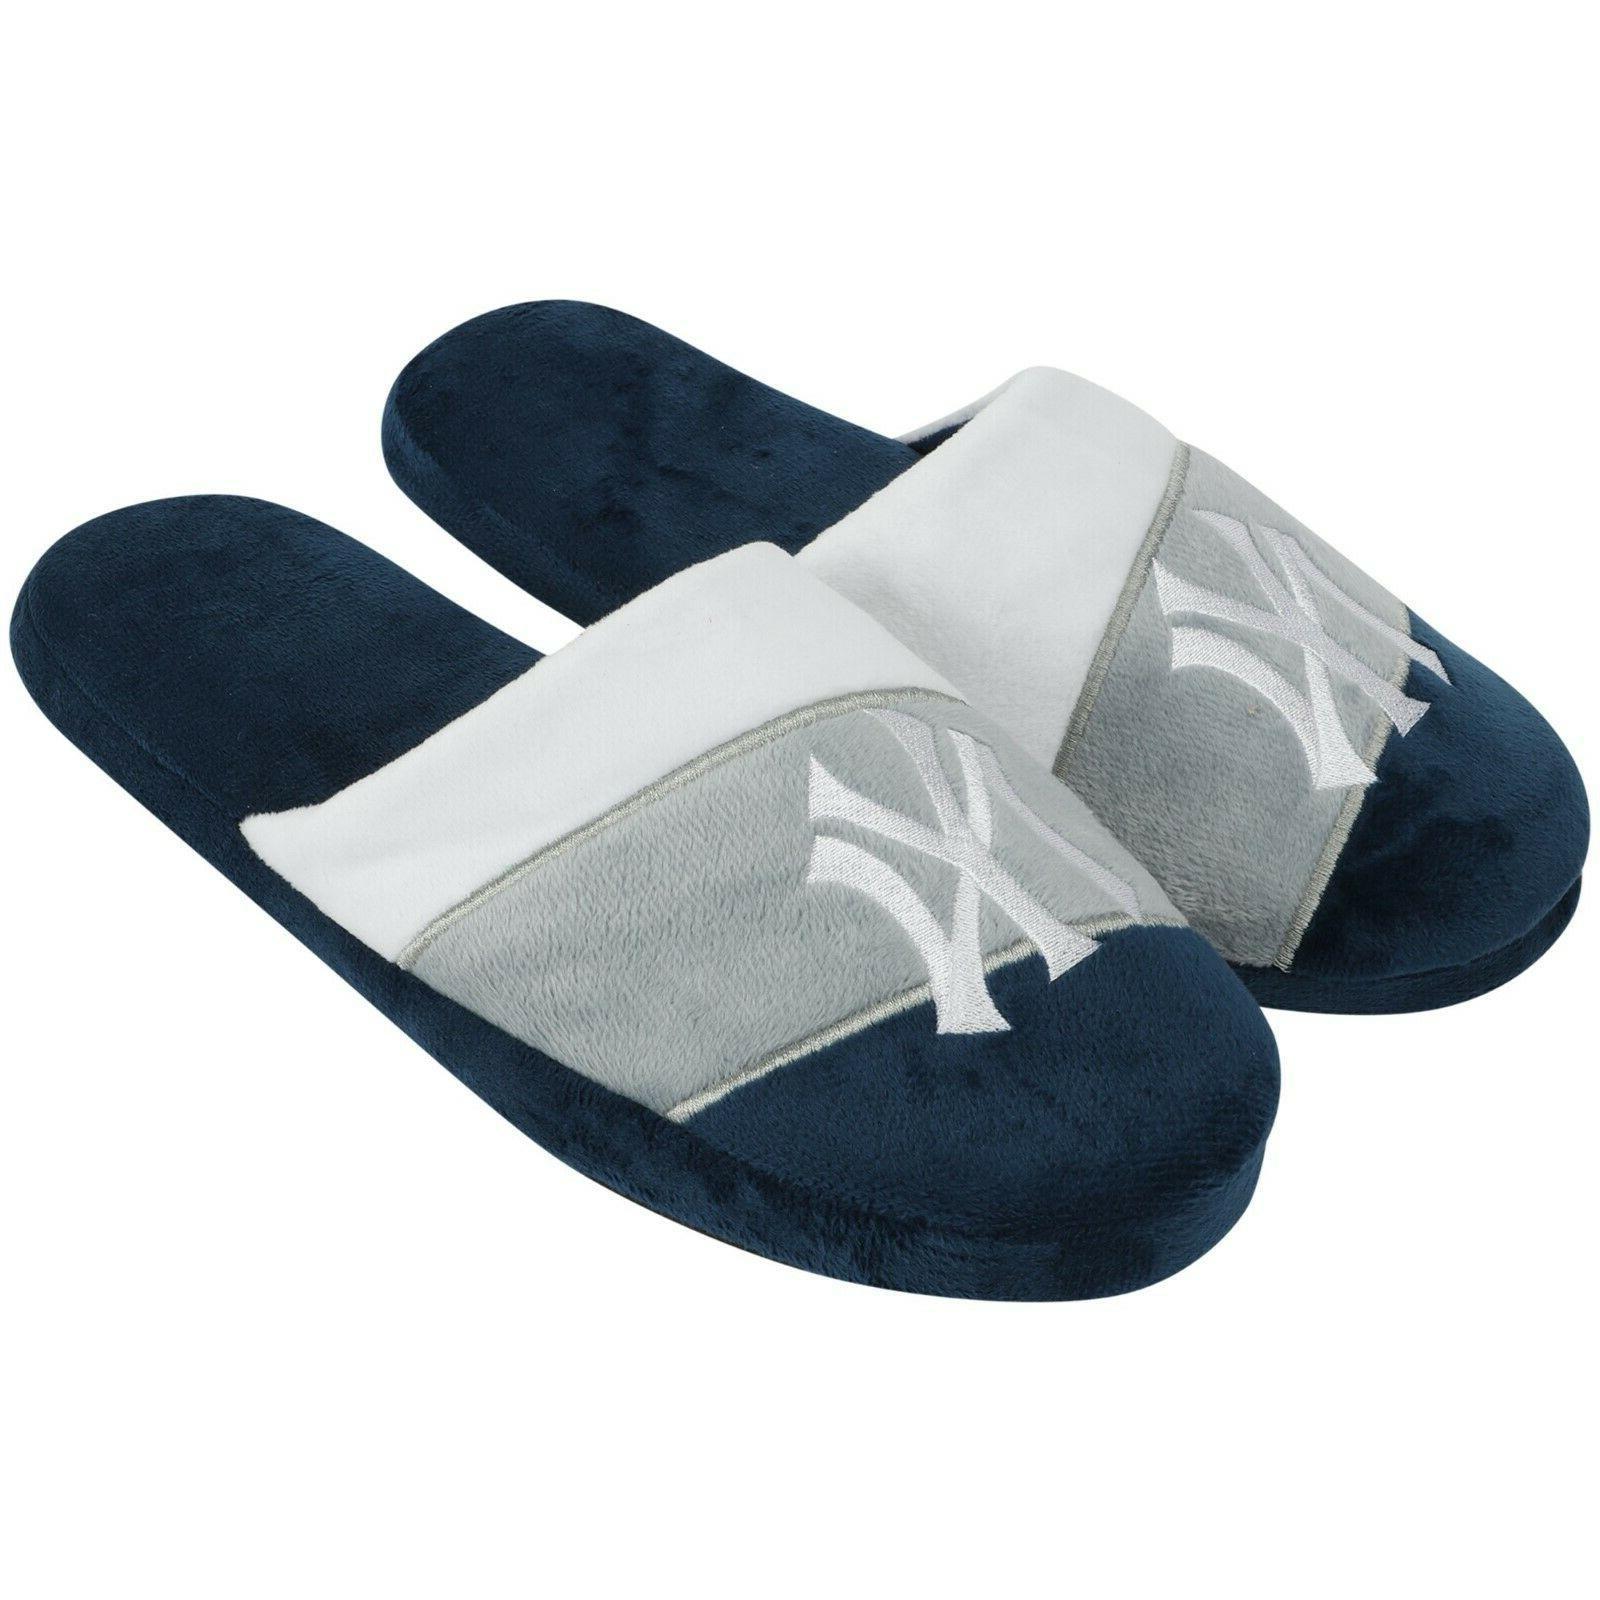 new york yankees team colorblock slide slippers